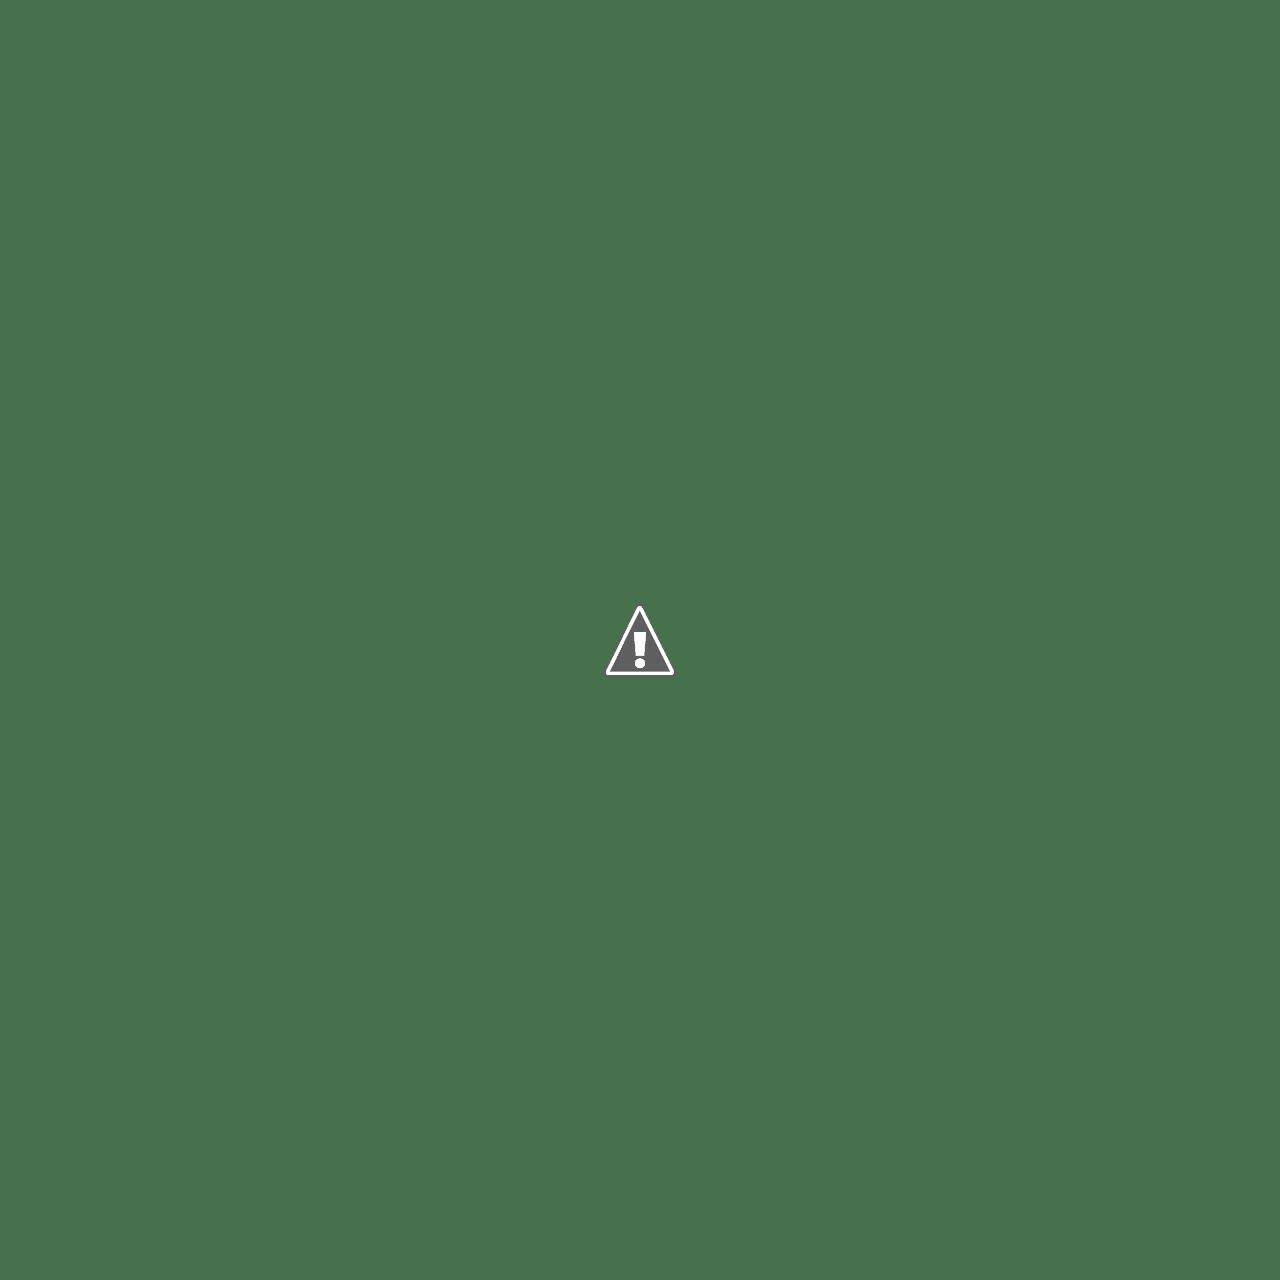 ACE Engineering Academy Visakhapatnam - Leading institute